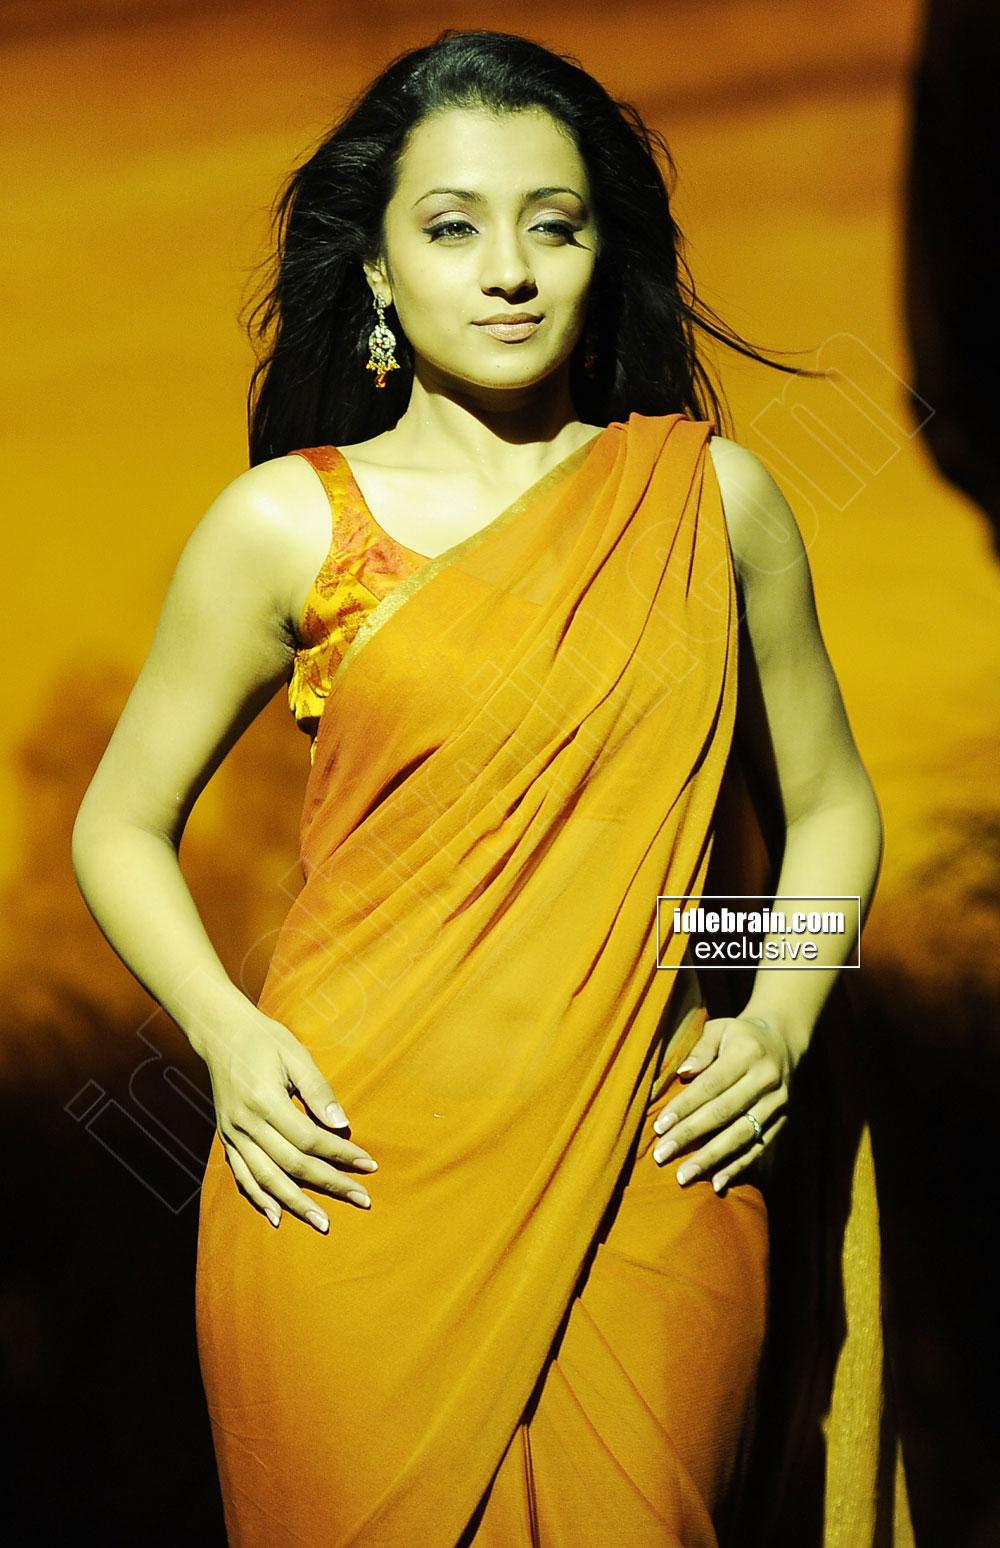 Trisha Krishnan In Saree Horny Expressions - Sabwoodcom-9692